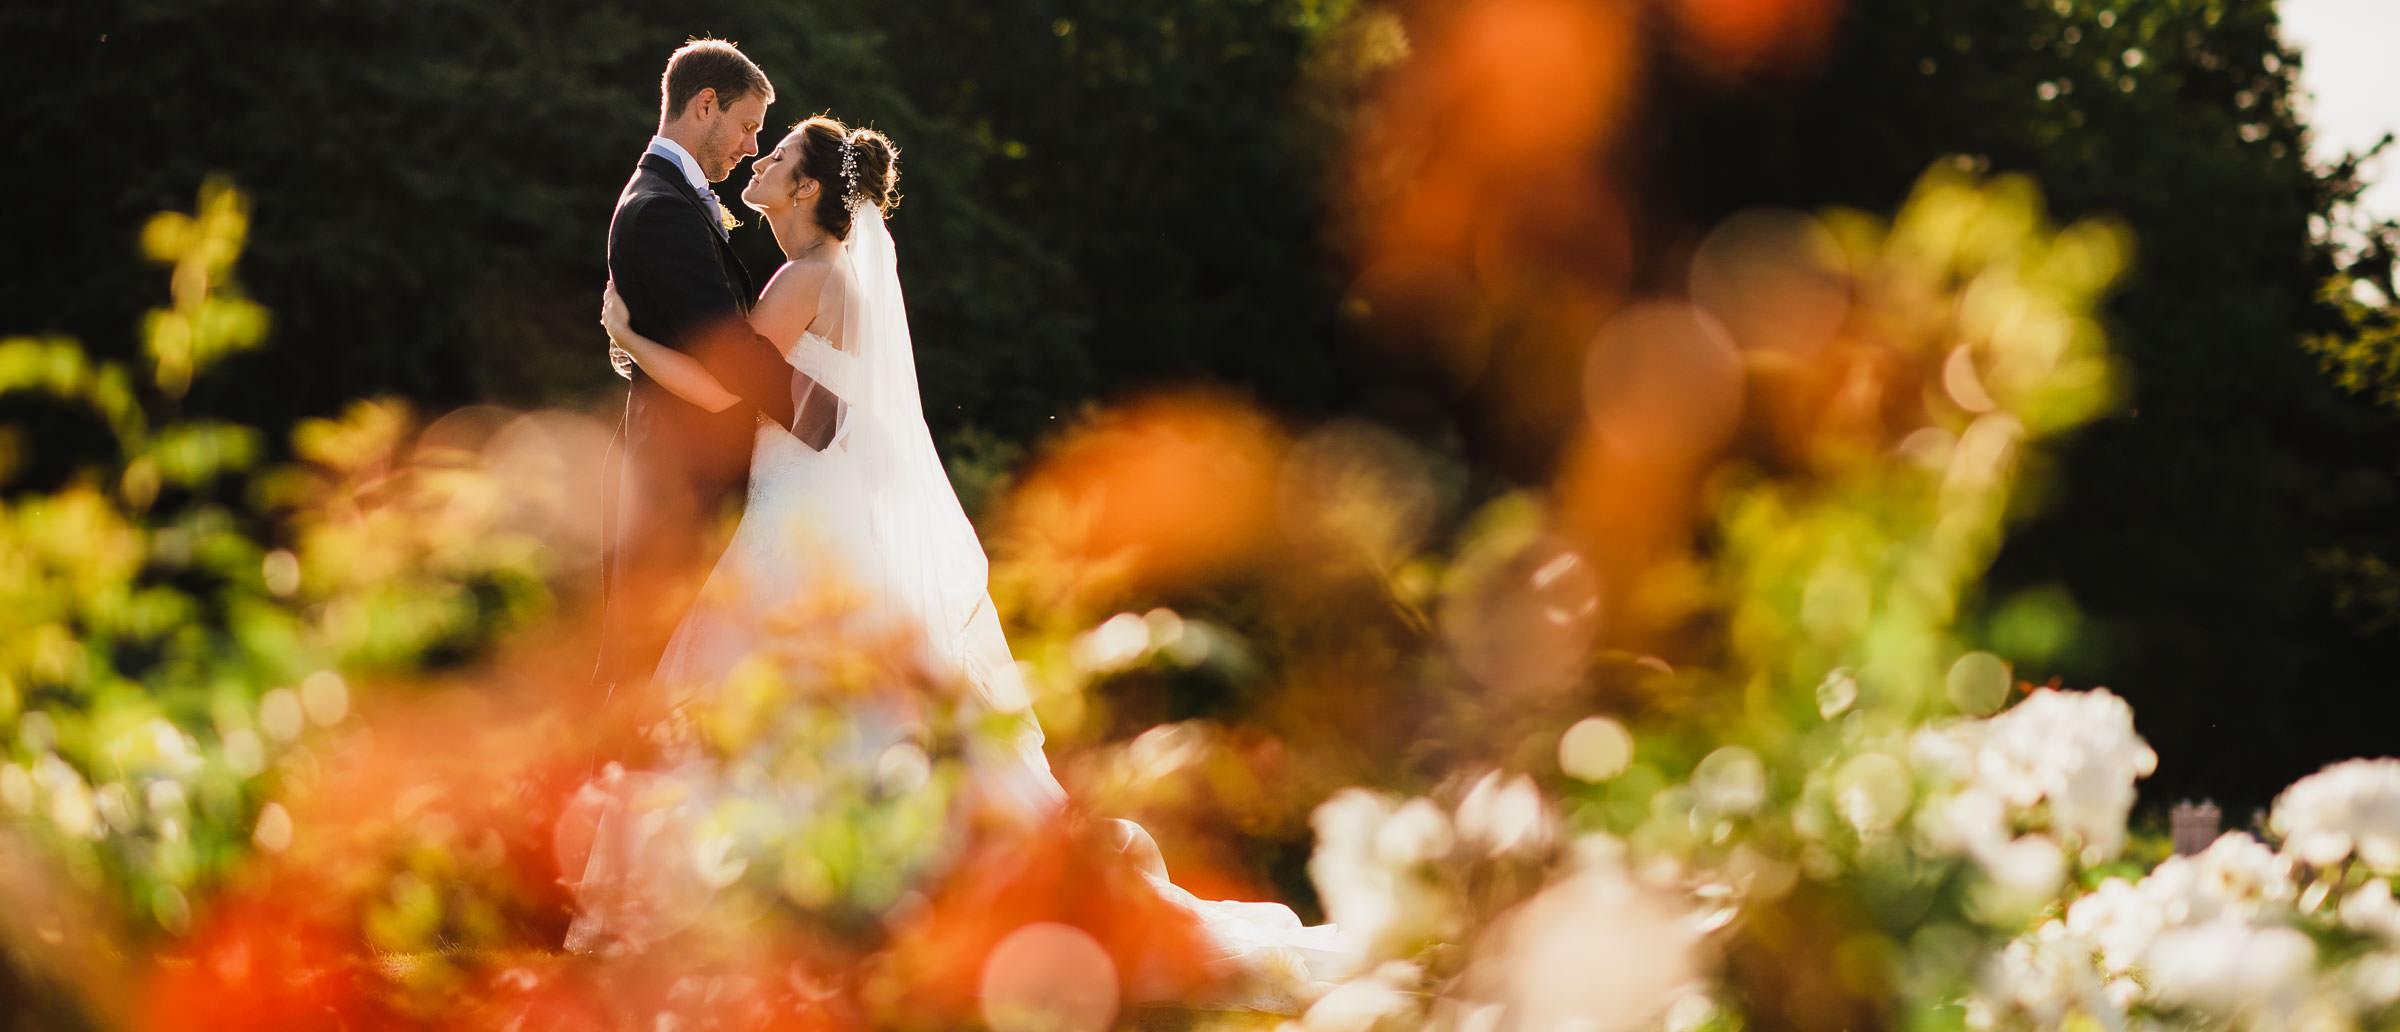 Beautiful wedding photography at Delbury Hall in Shropshire